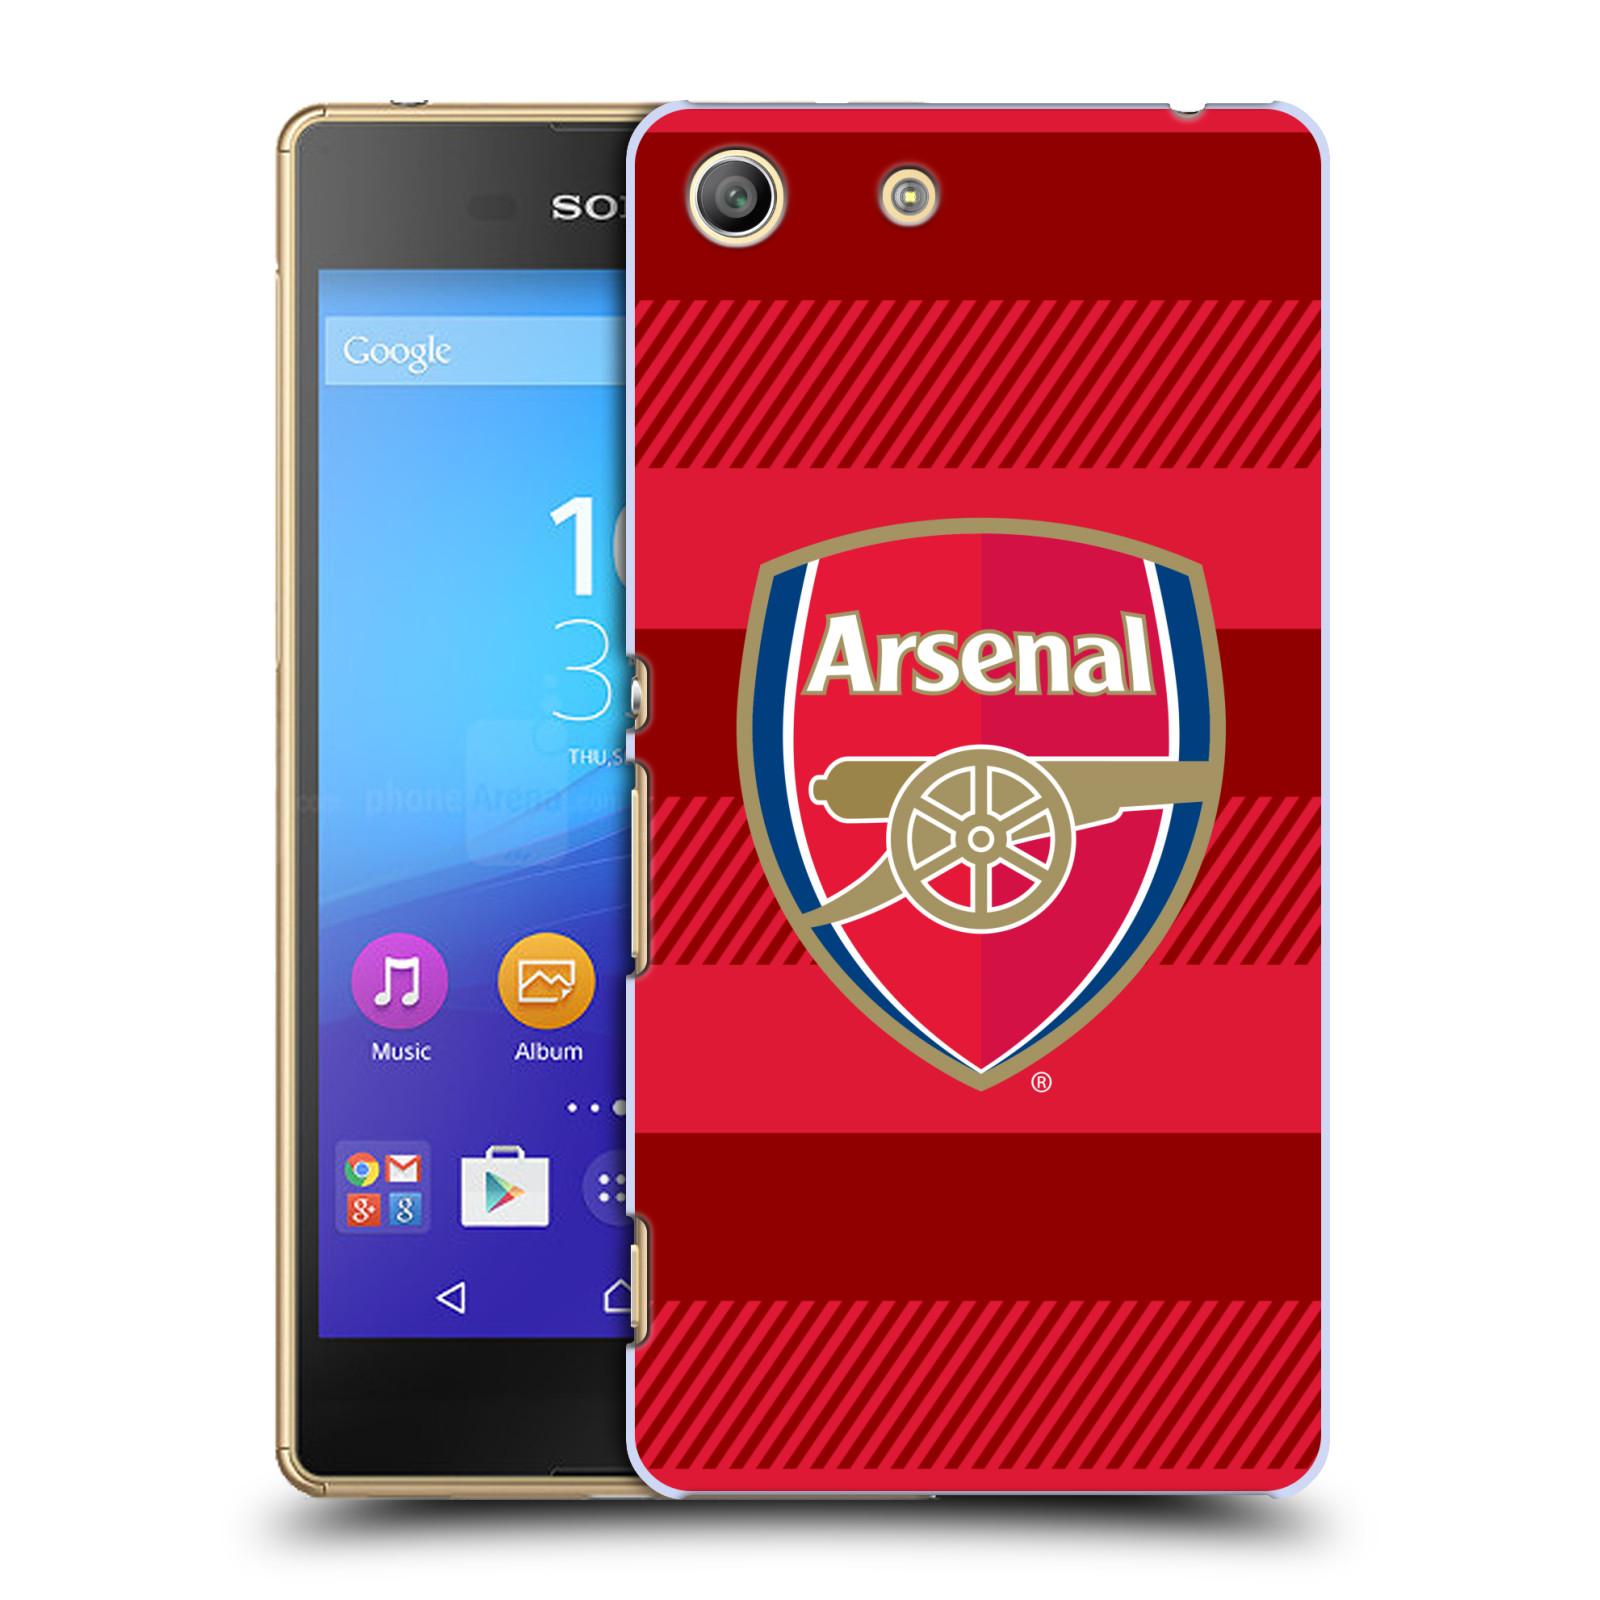 Plastové pouzdro na mobil Sony Xperia M5 - Head Case - Arsenal FC - Logo s pruhy